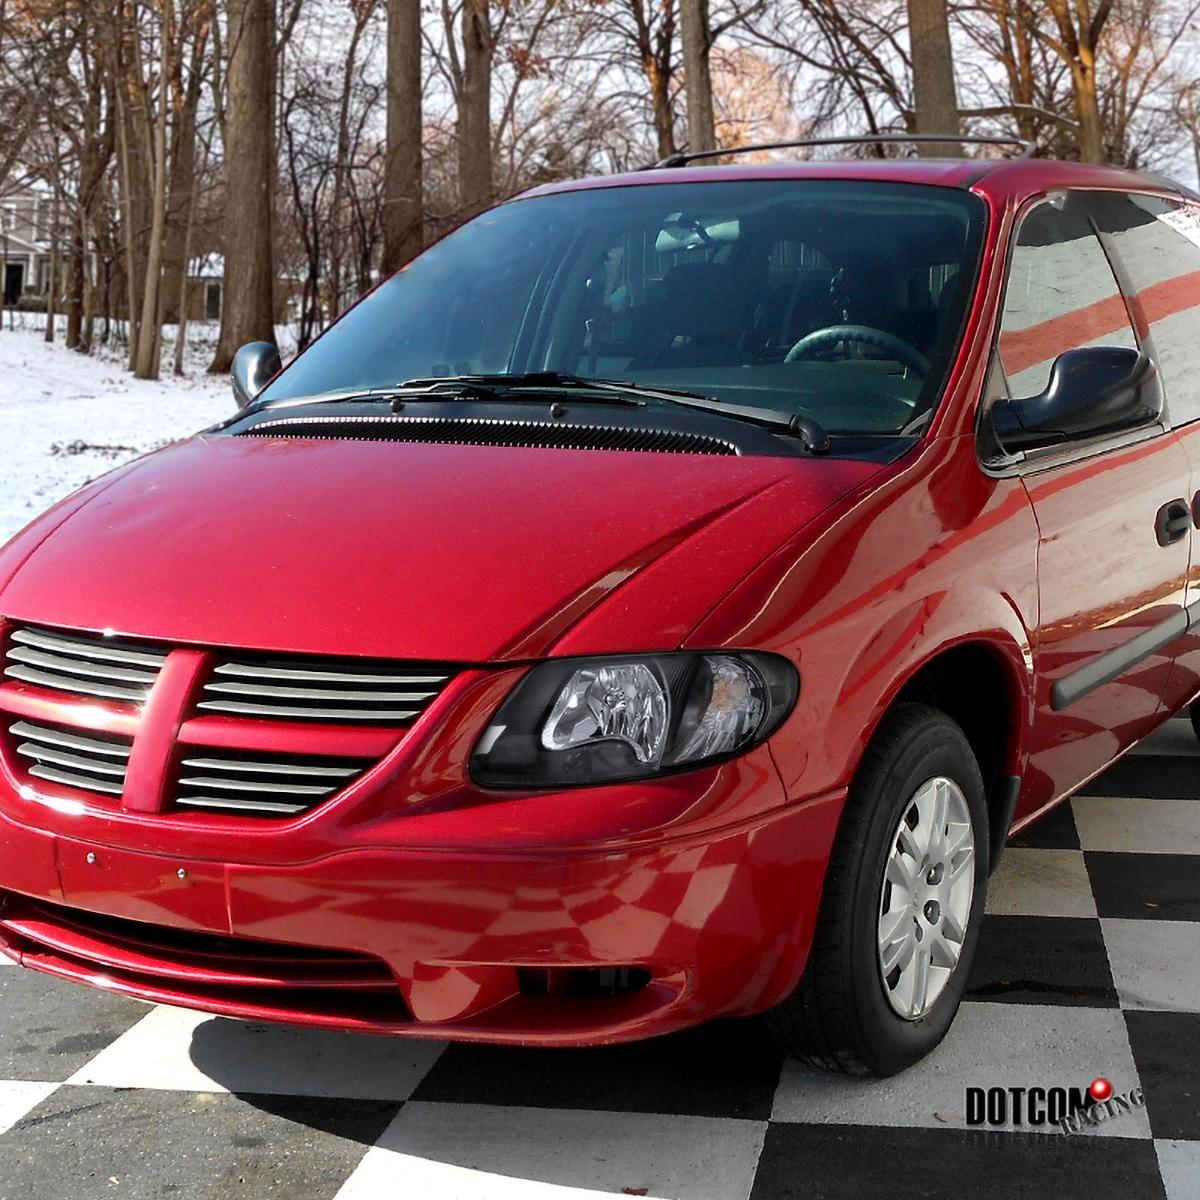 2001-2007 Dodge Caravan Chrysler Town & Country Euro Black